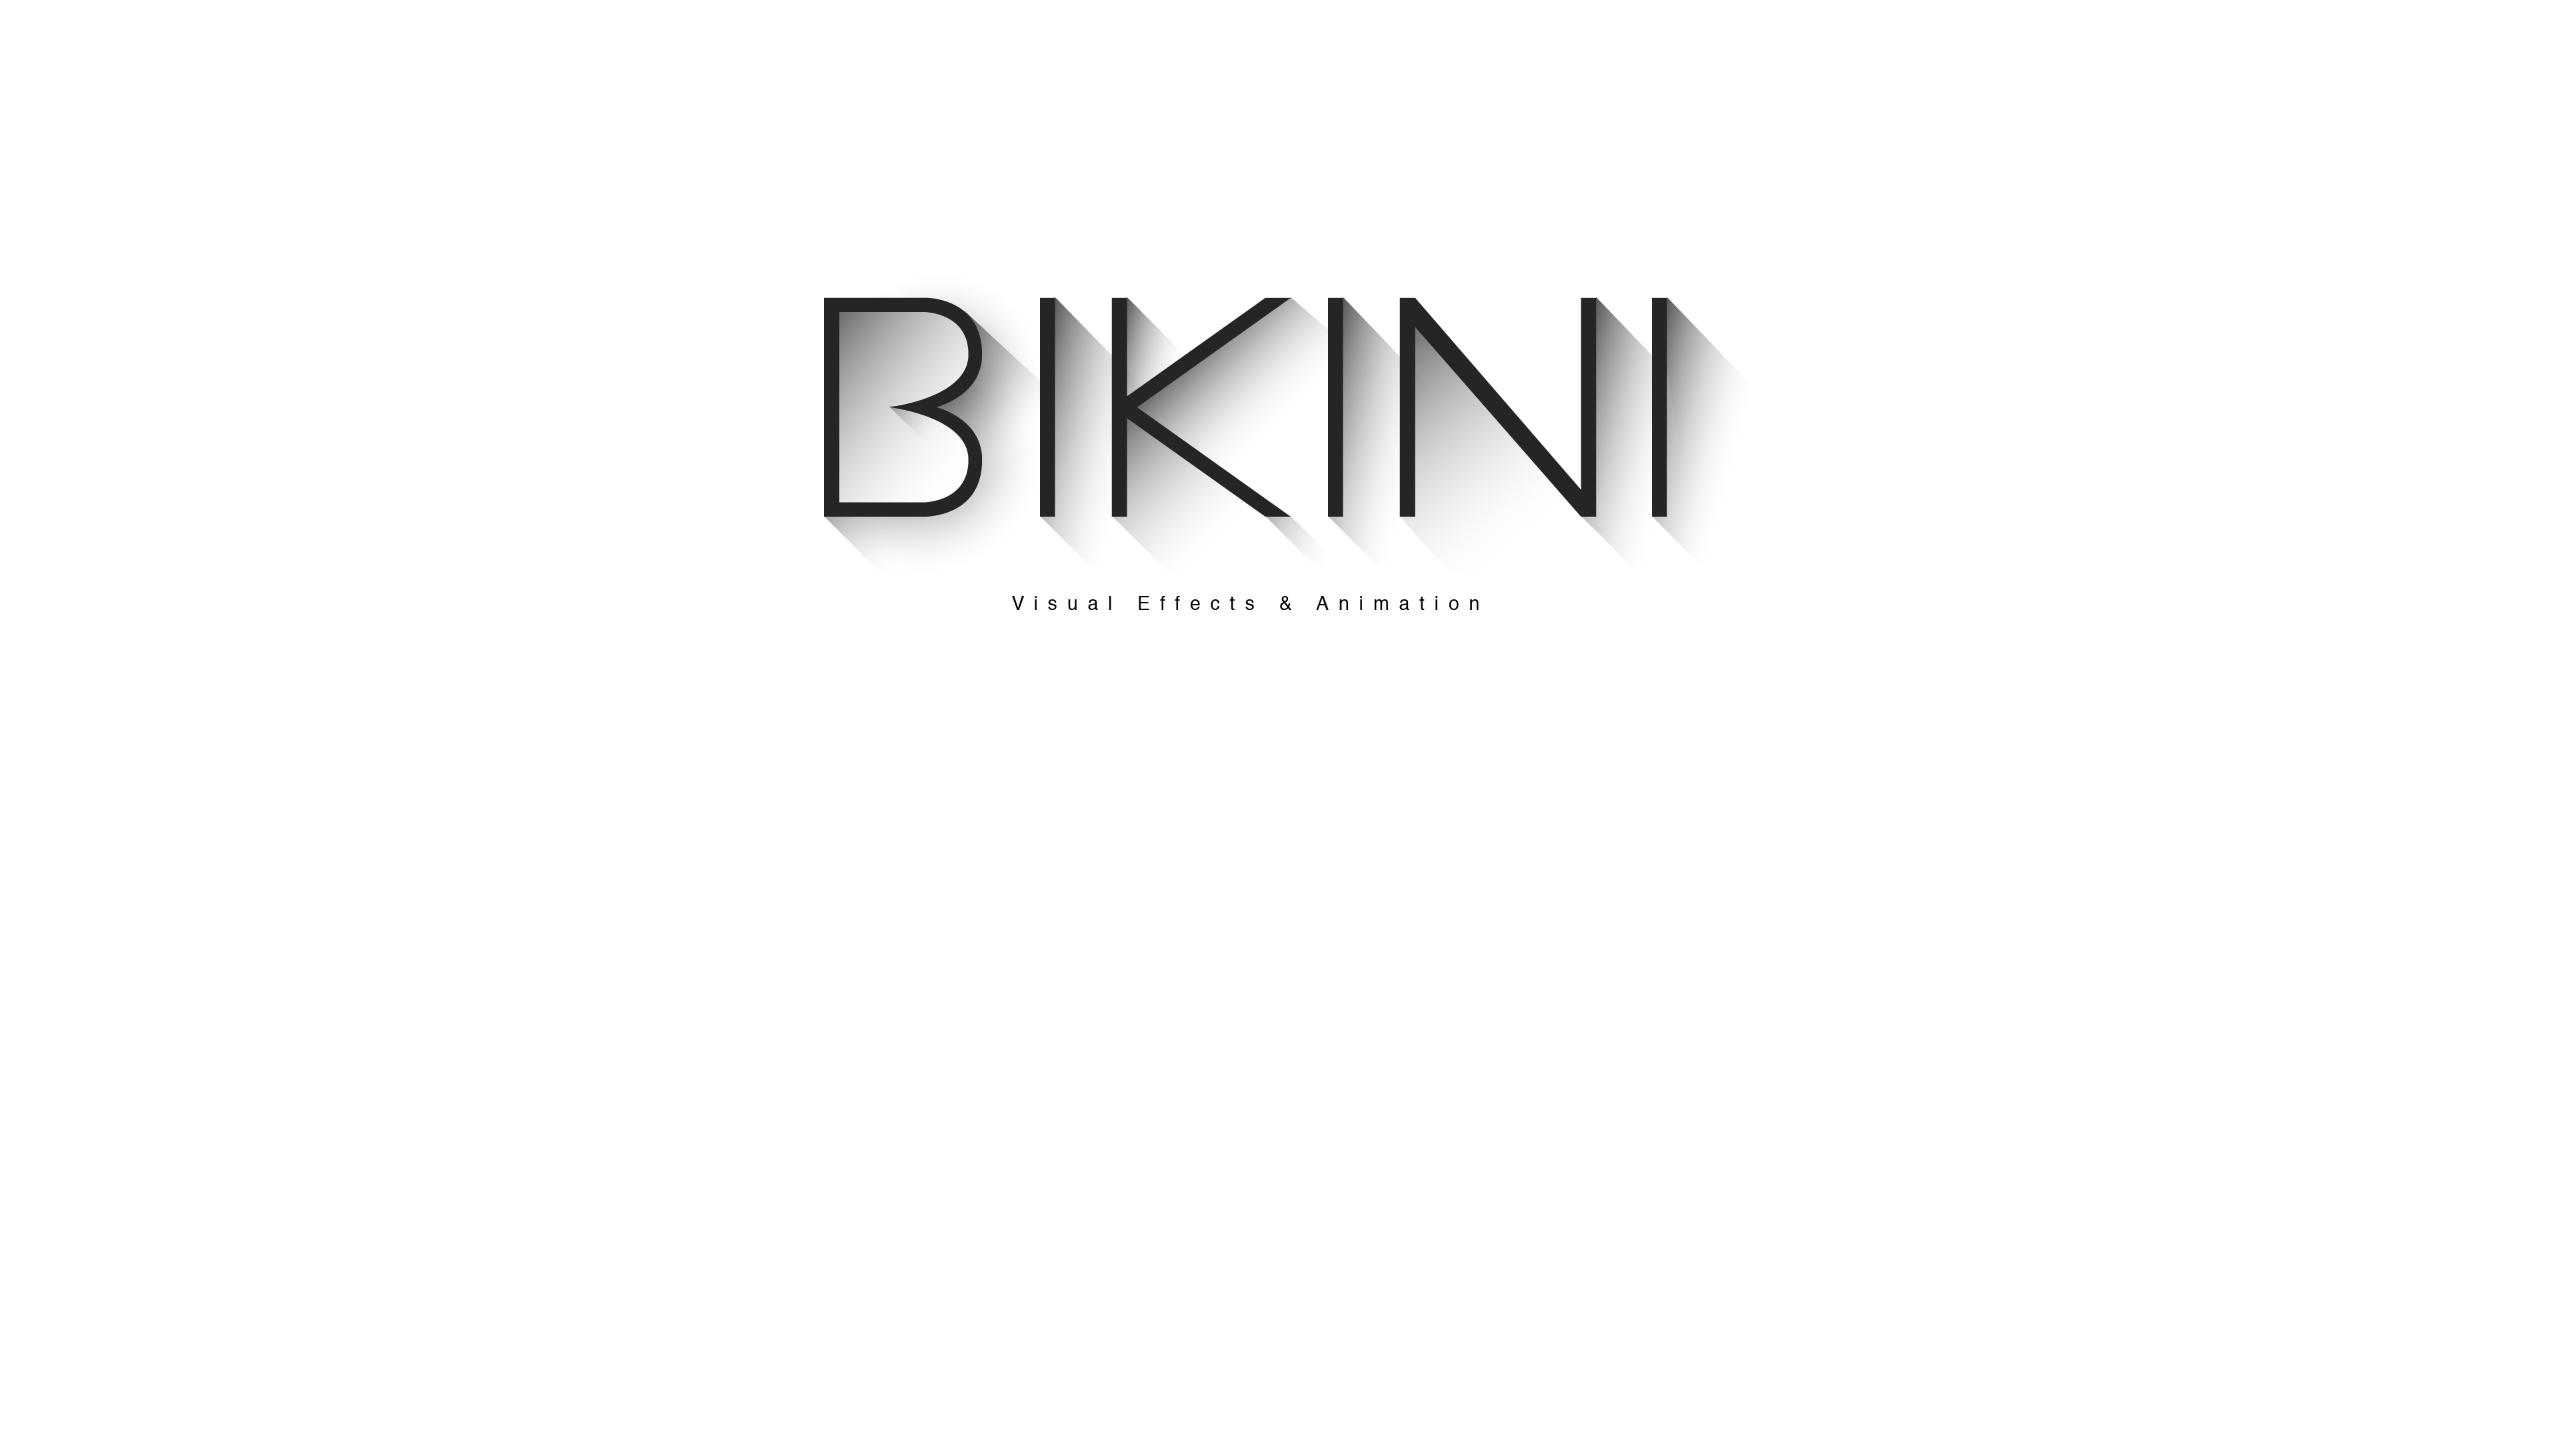 Bikini - Visual effects & animation (@bikinistudio) Cover Image